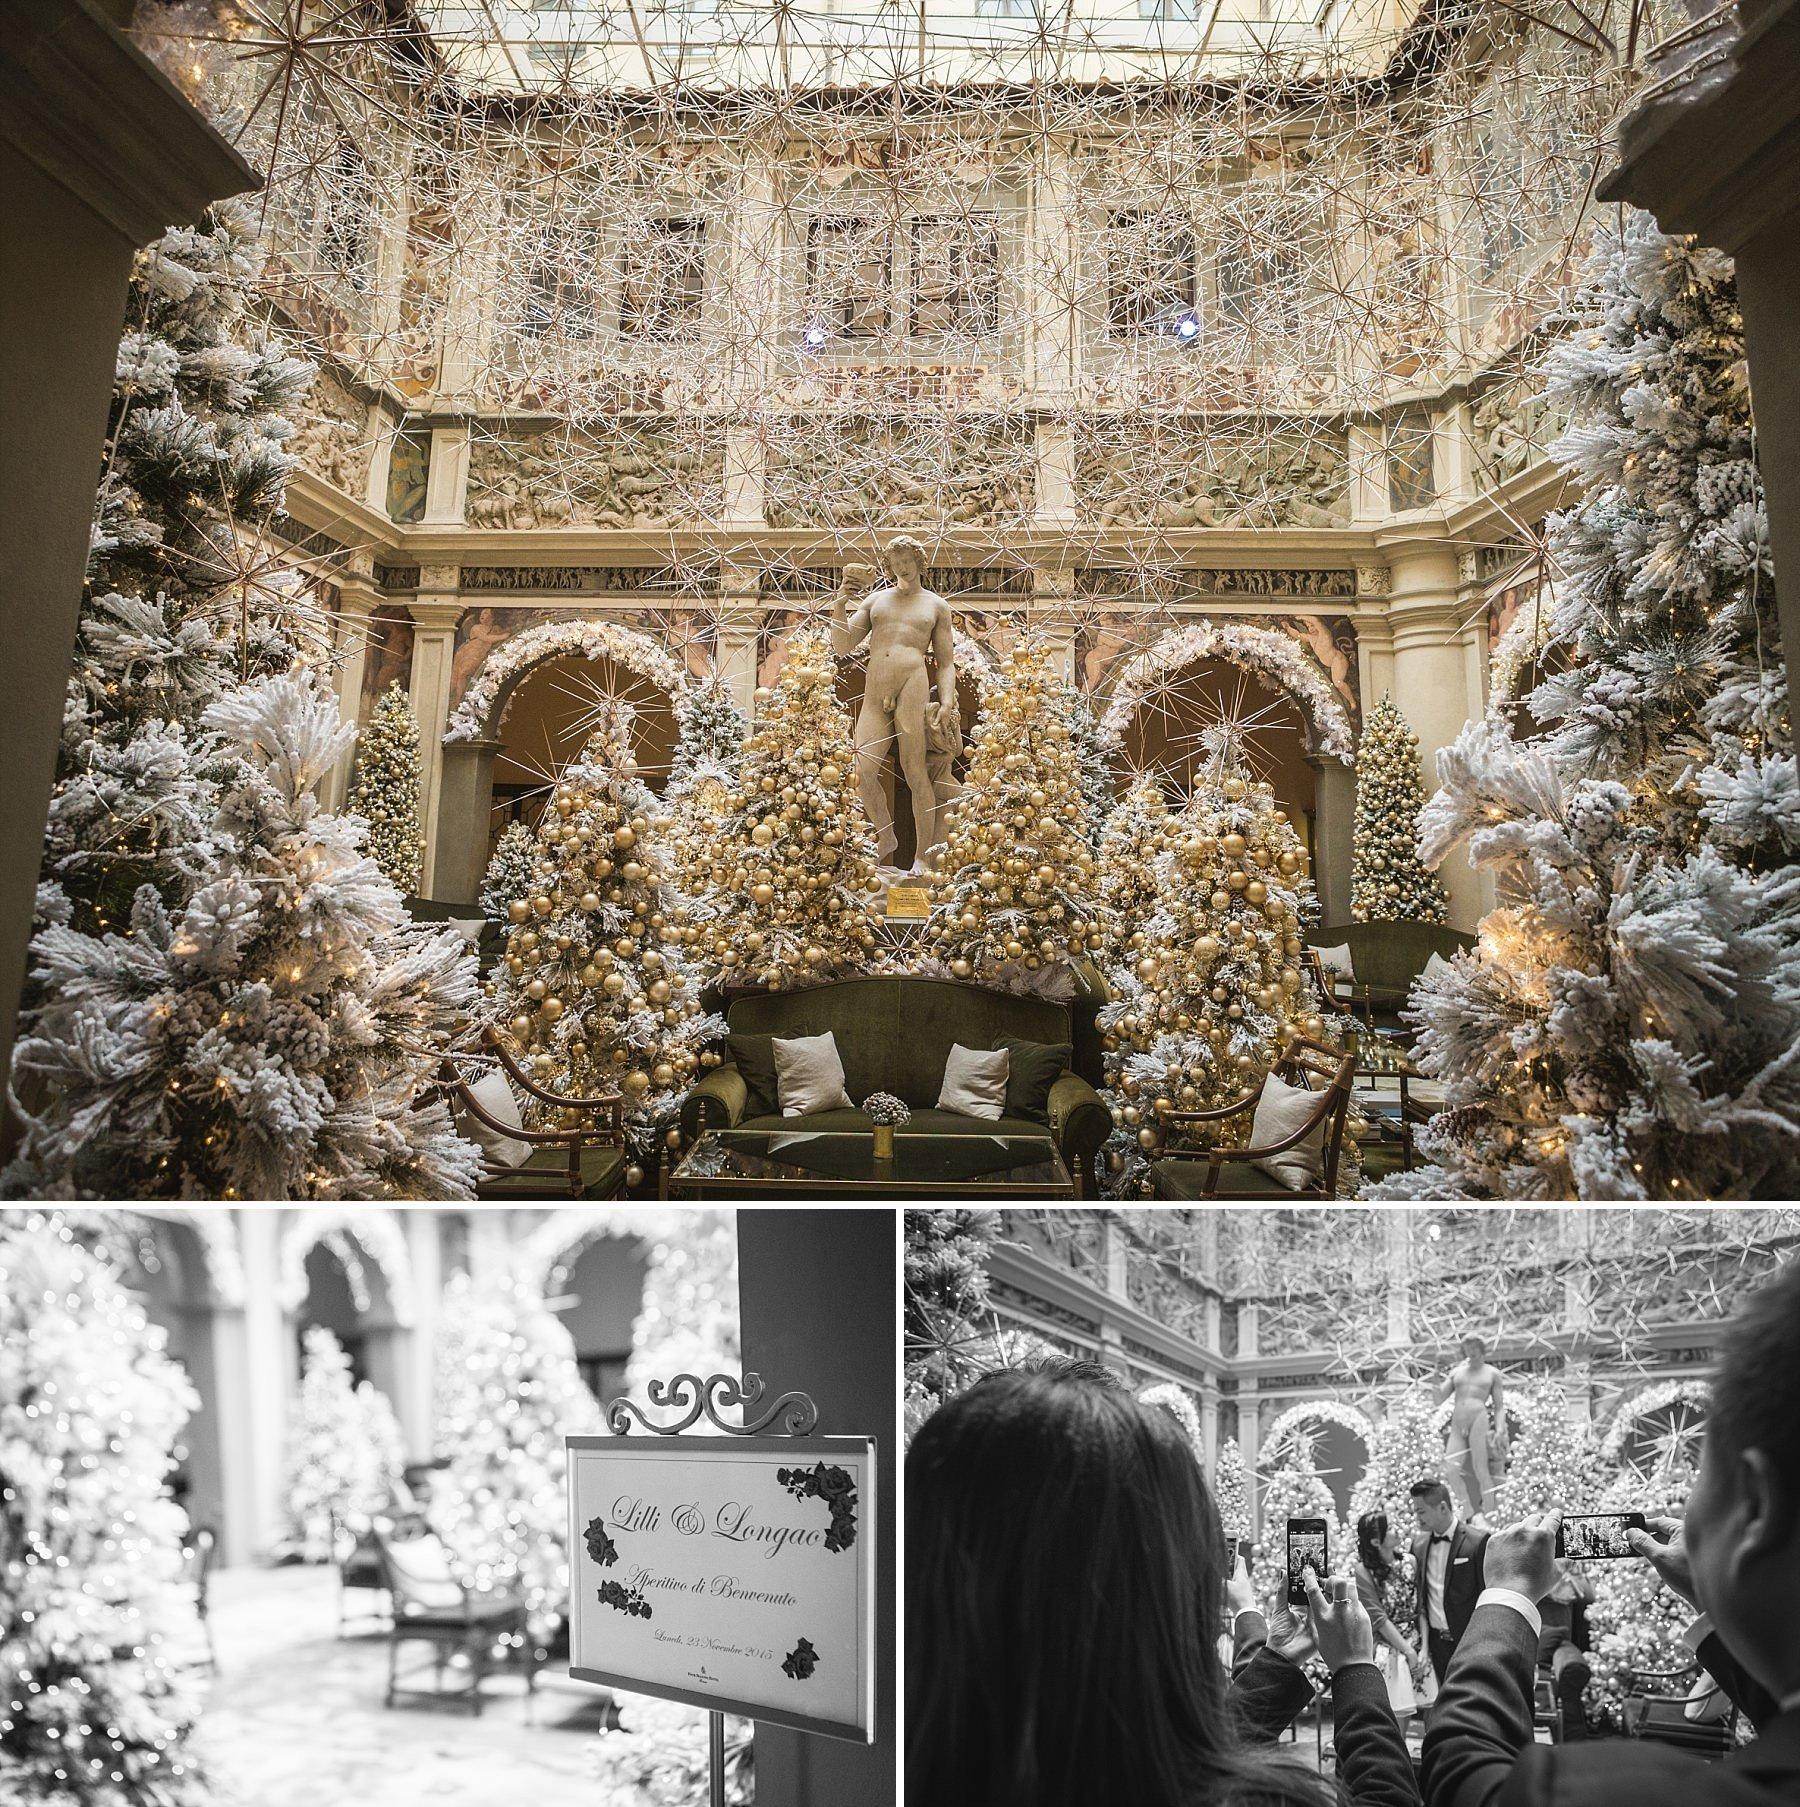 fotografo di matrimoni a firenze four seasons 22 2